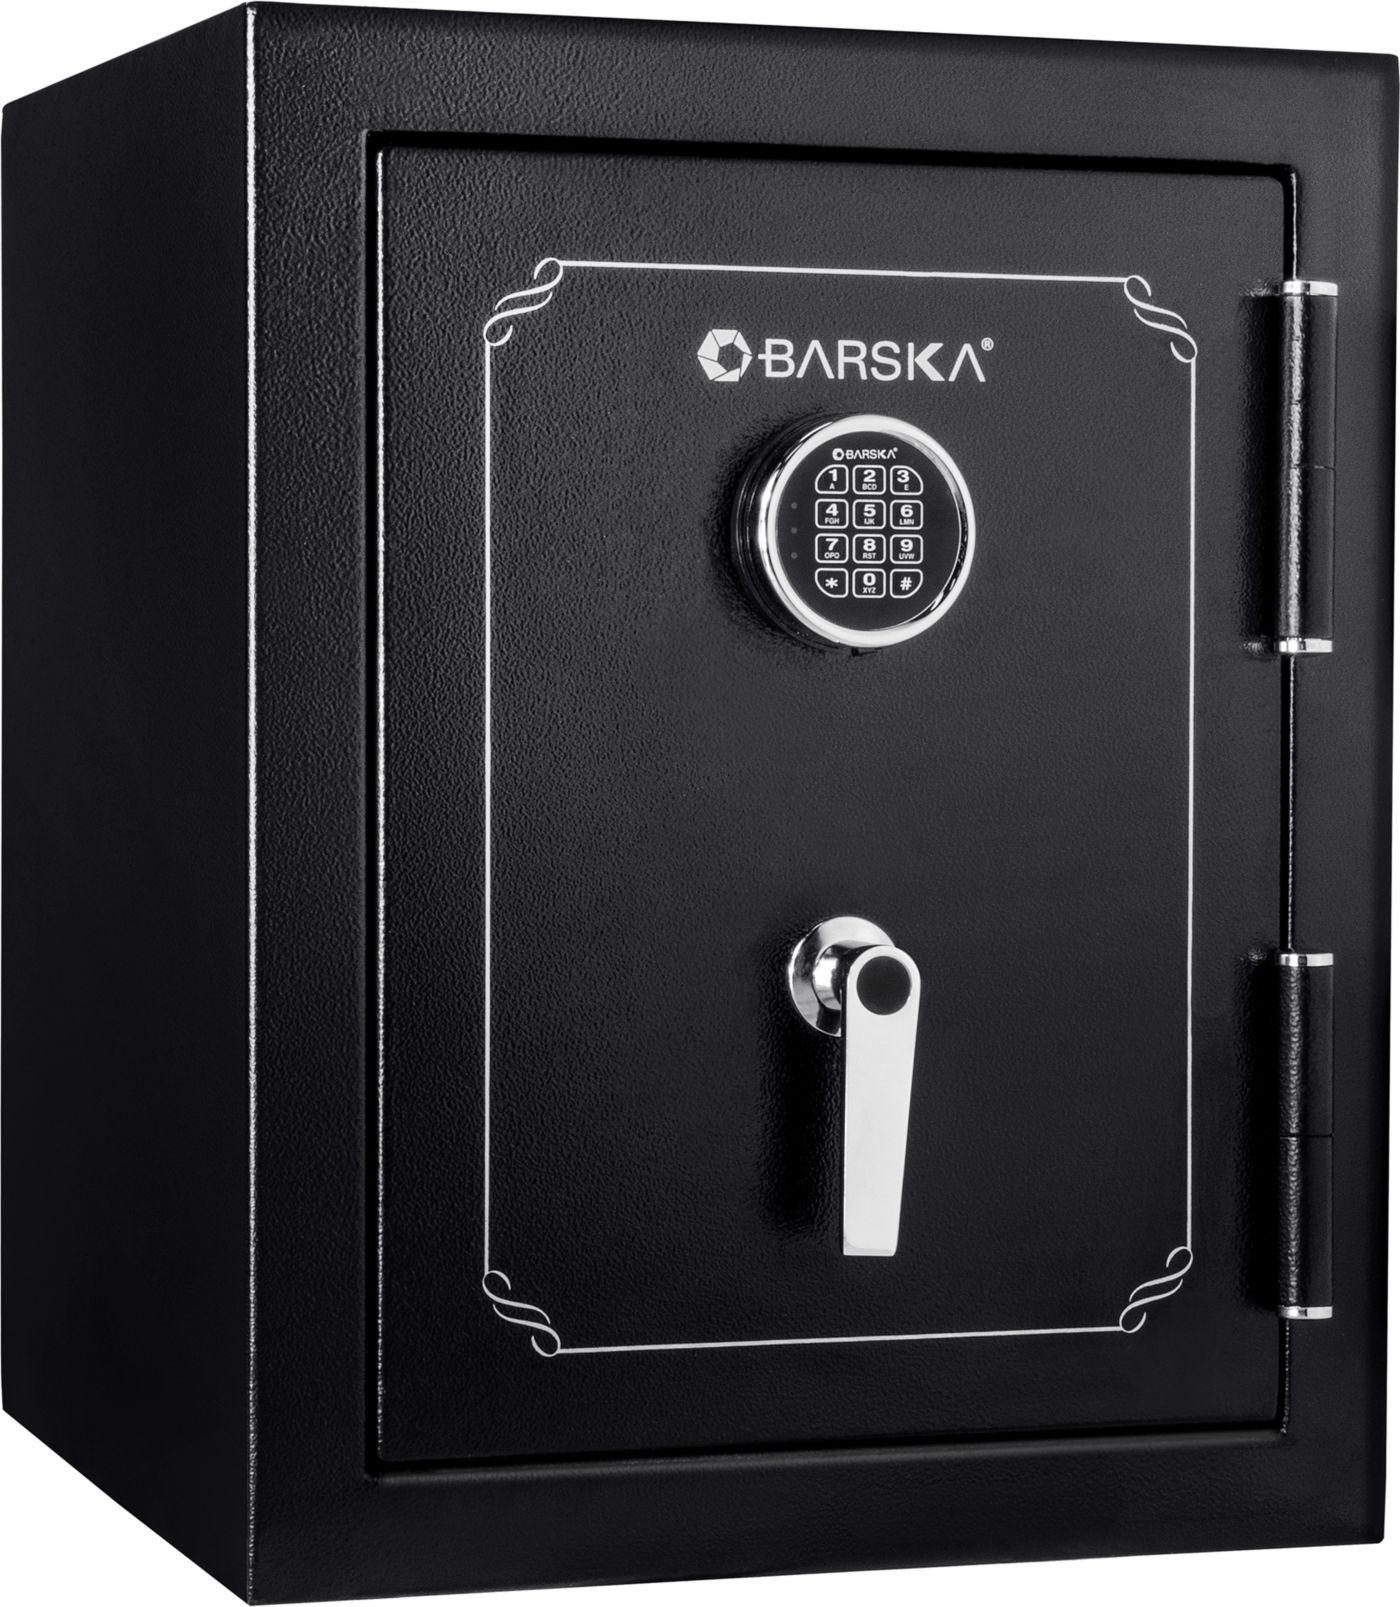 Barska Fire Vault Safe with Keypad Lock